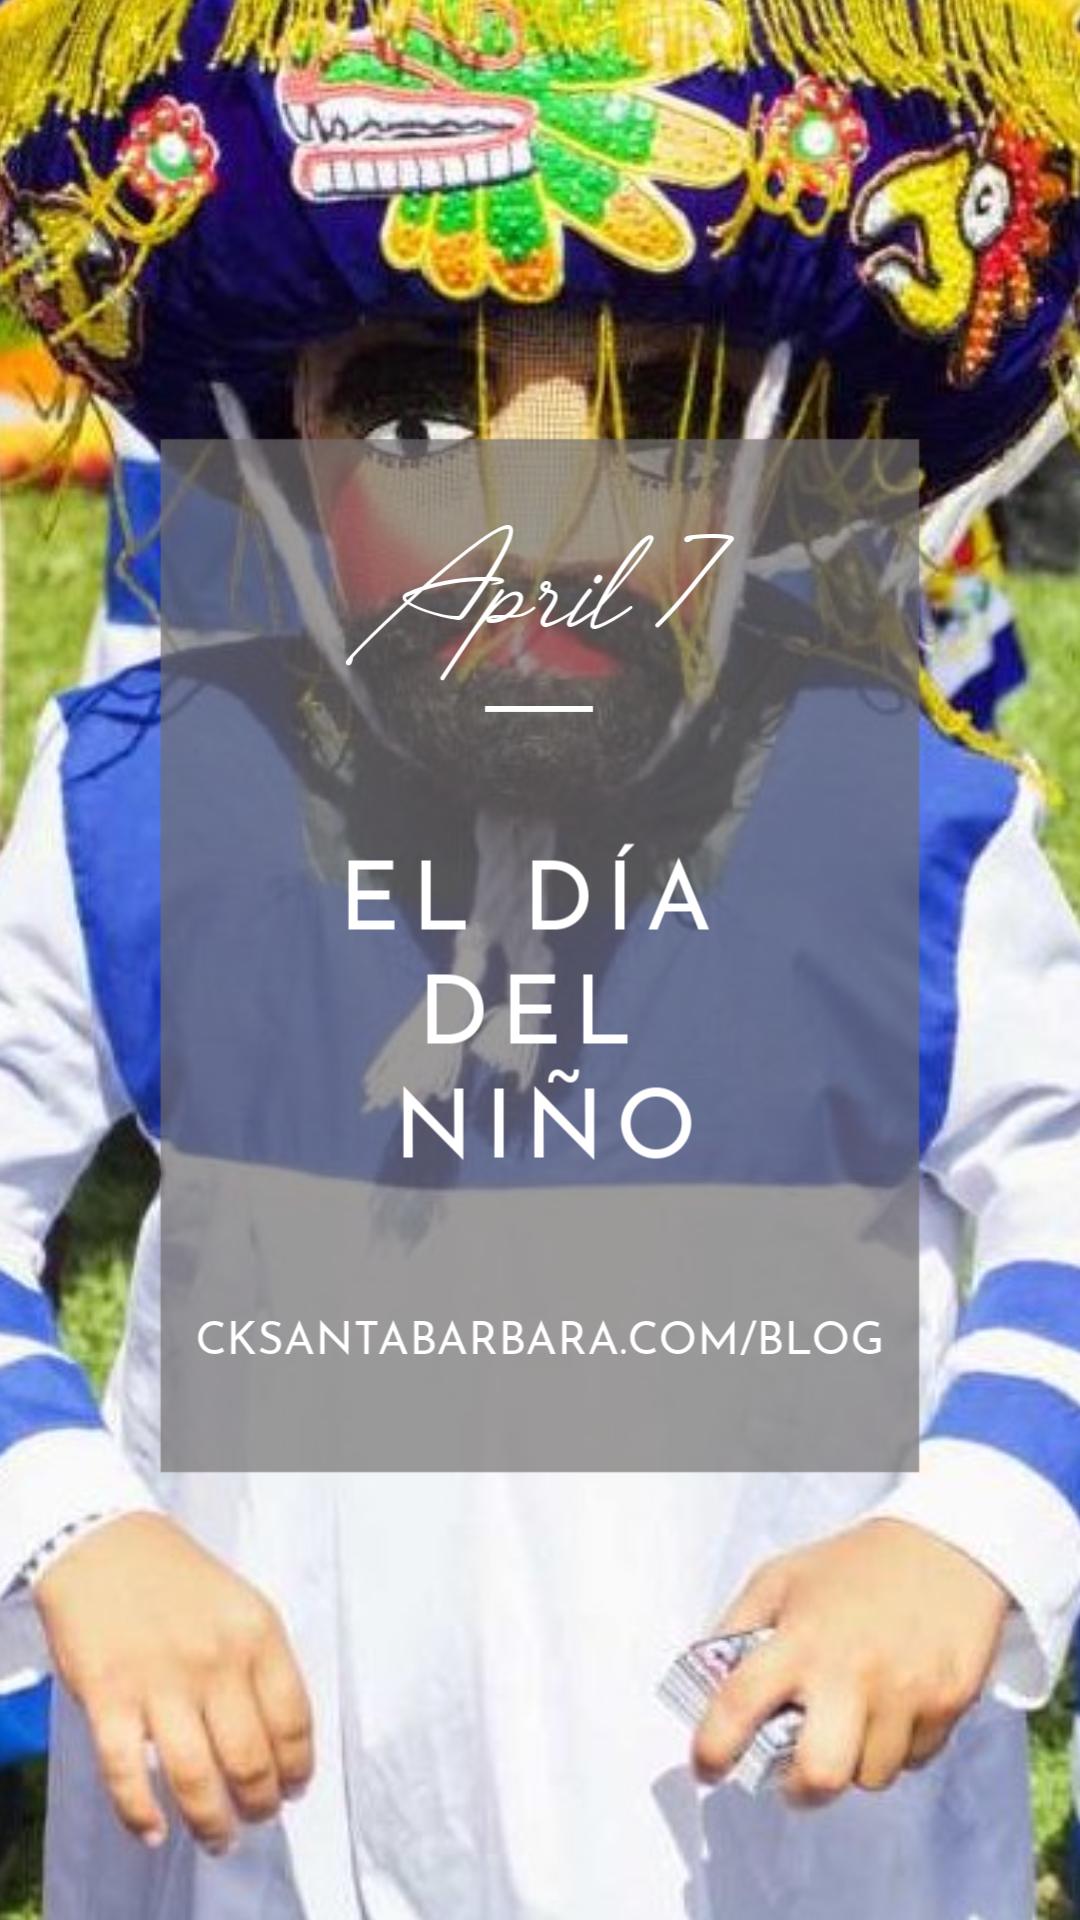 April 7 El Día Del Niño.png